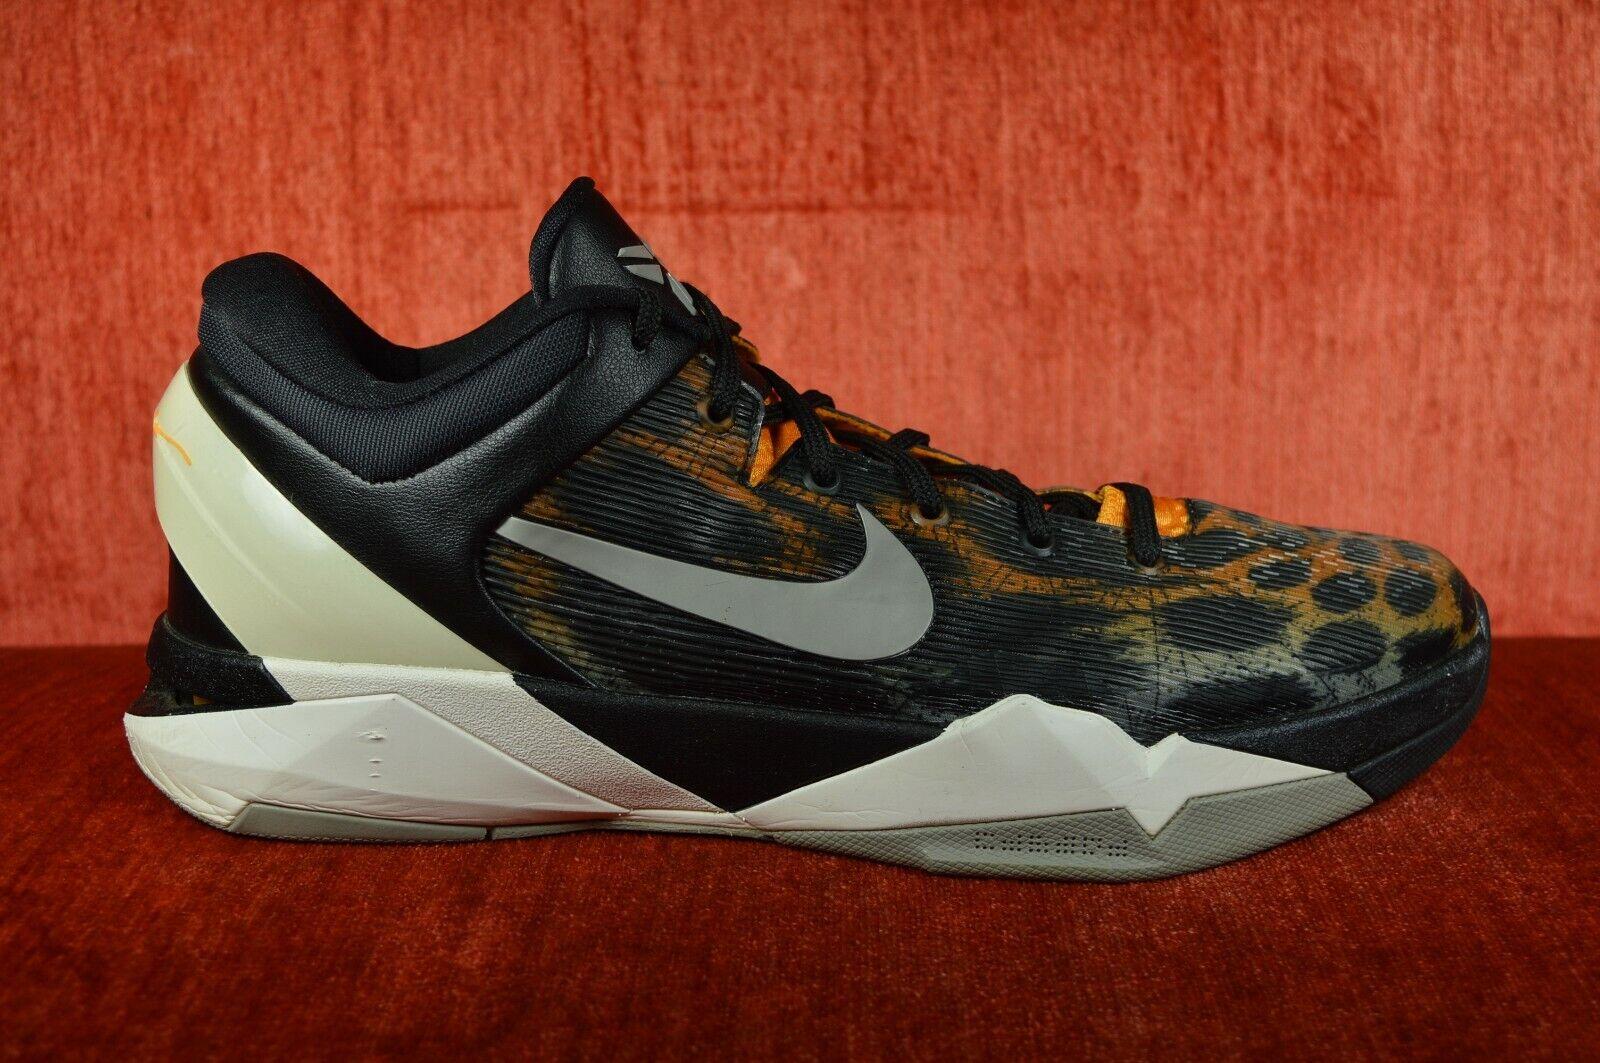 DS Nike Zoom Kobe VII 7 System Leopard 12